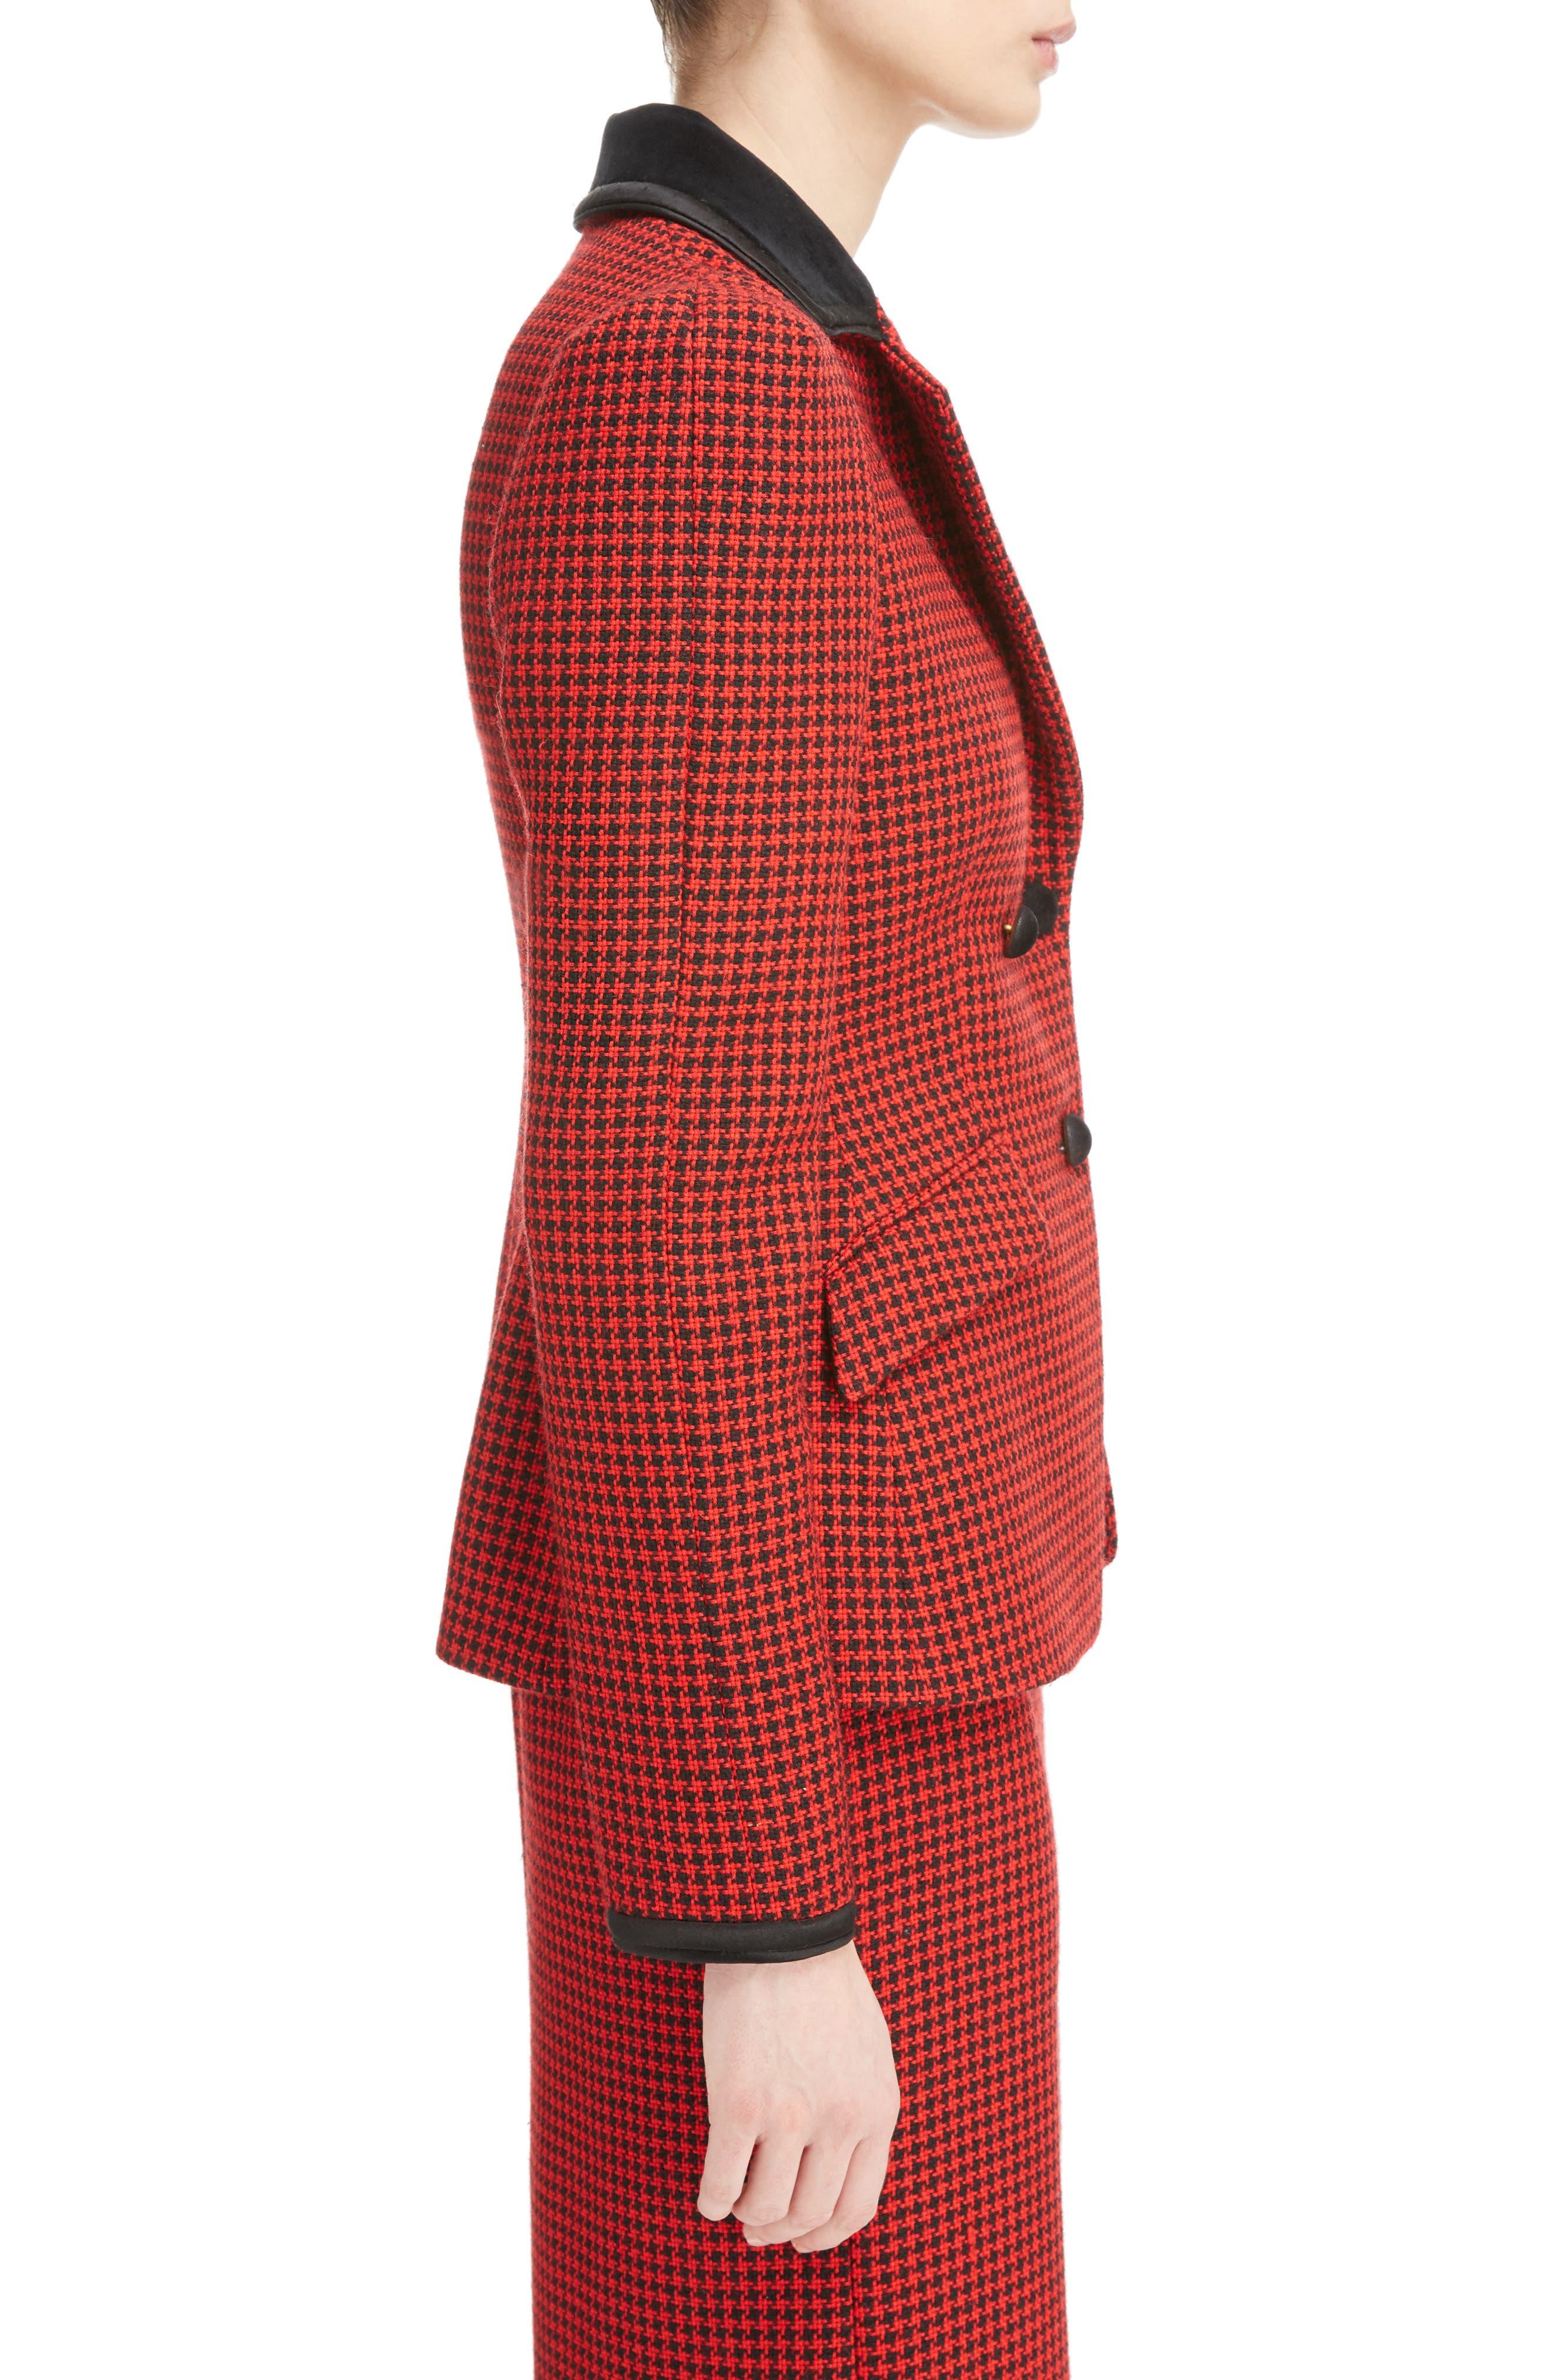 Paladini Houndstooth Wool Jacket,                             Alternate thumbnail 3, color,                             Scarlet/ Black